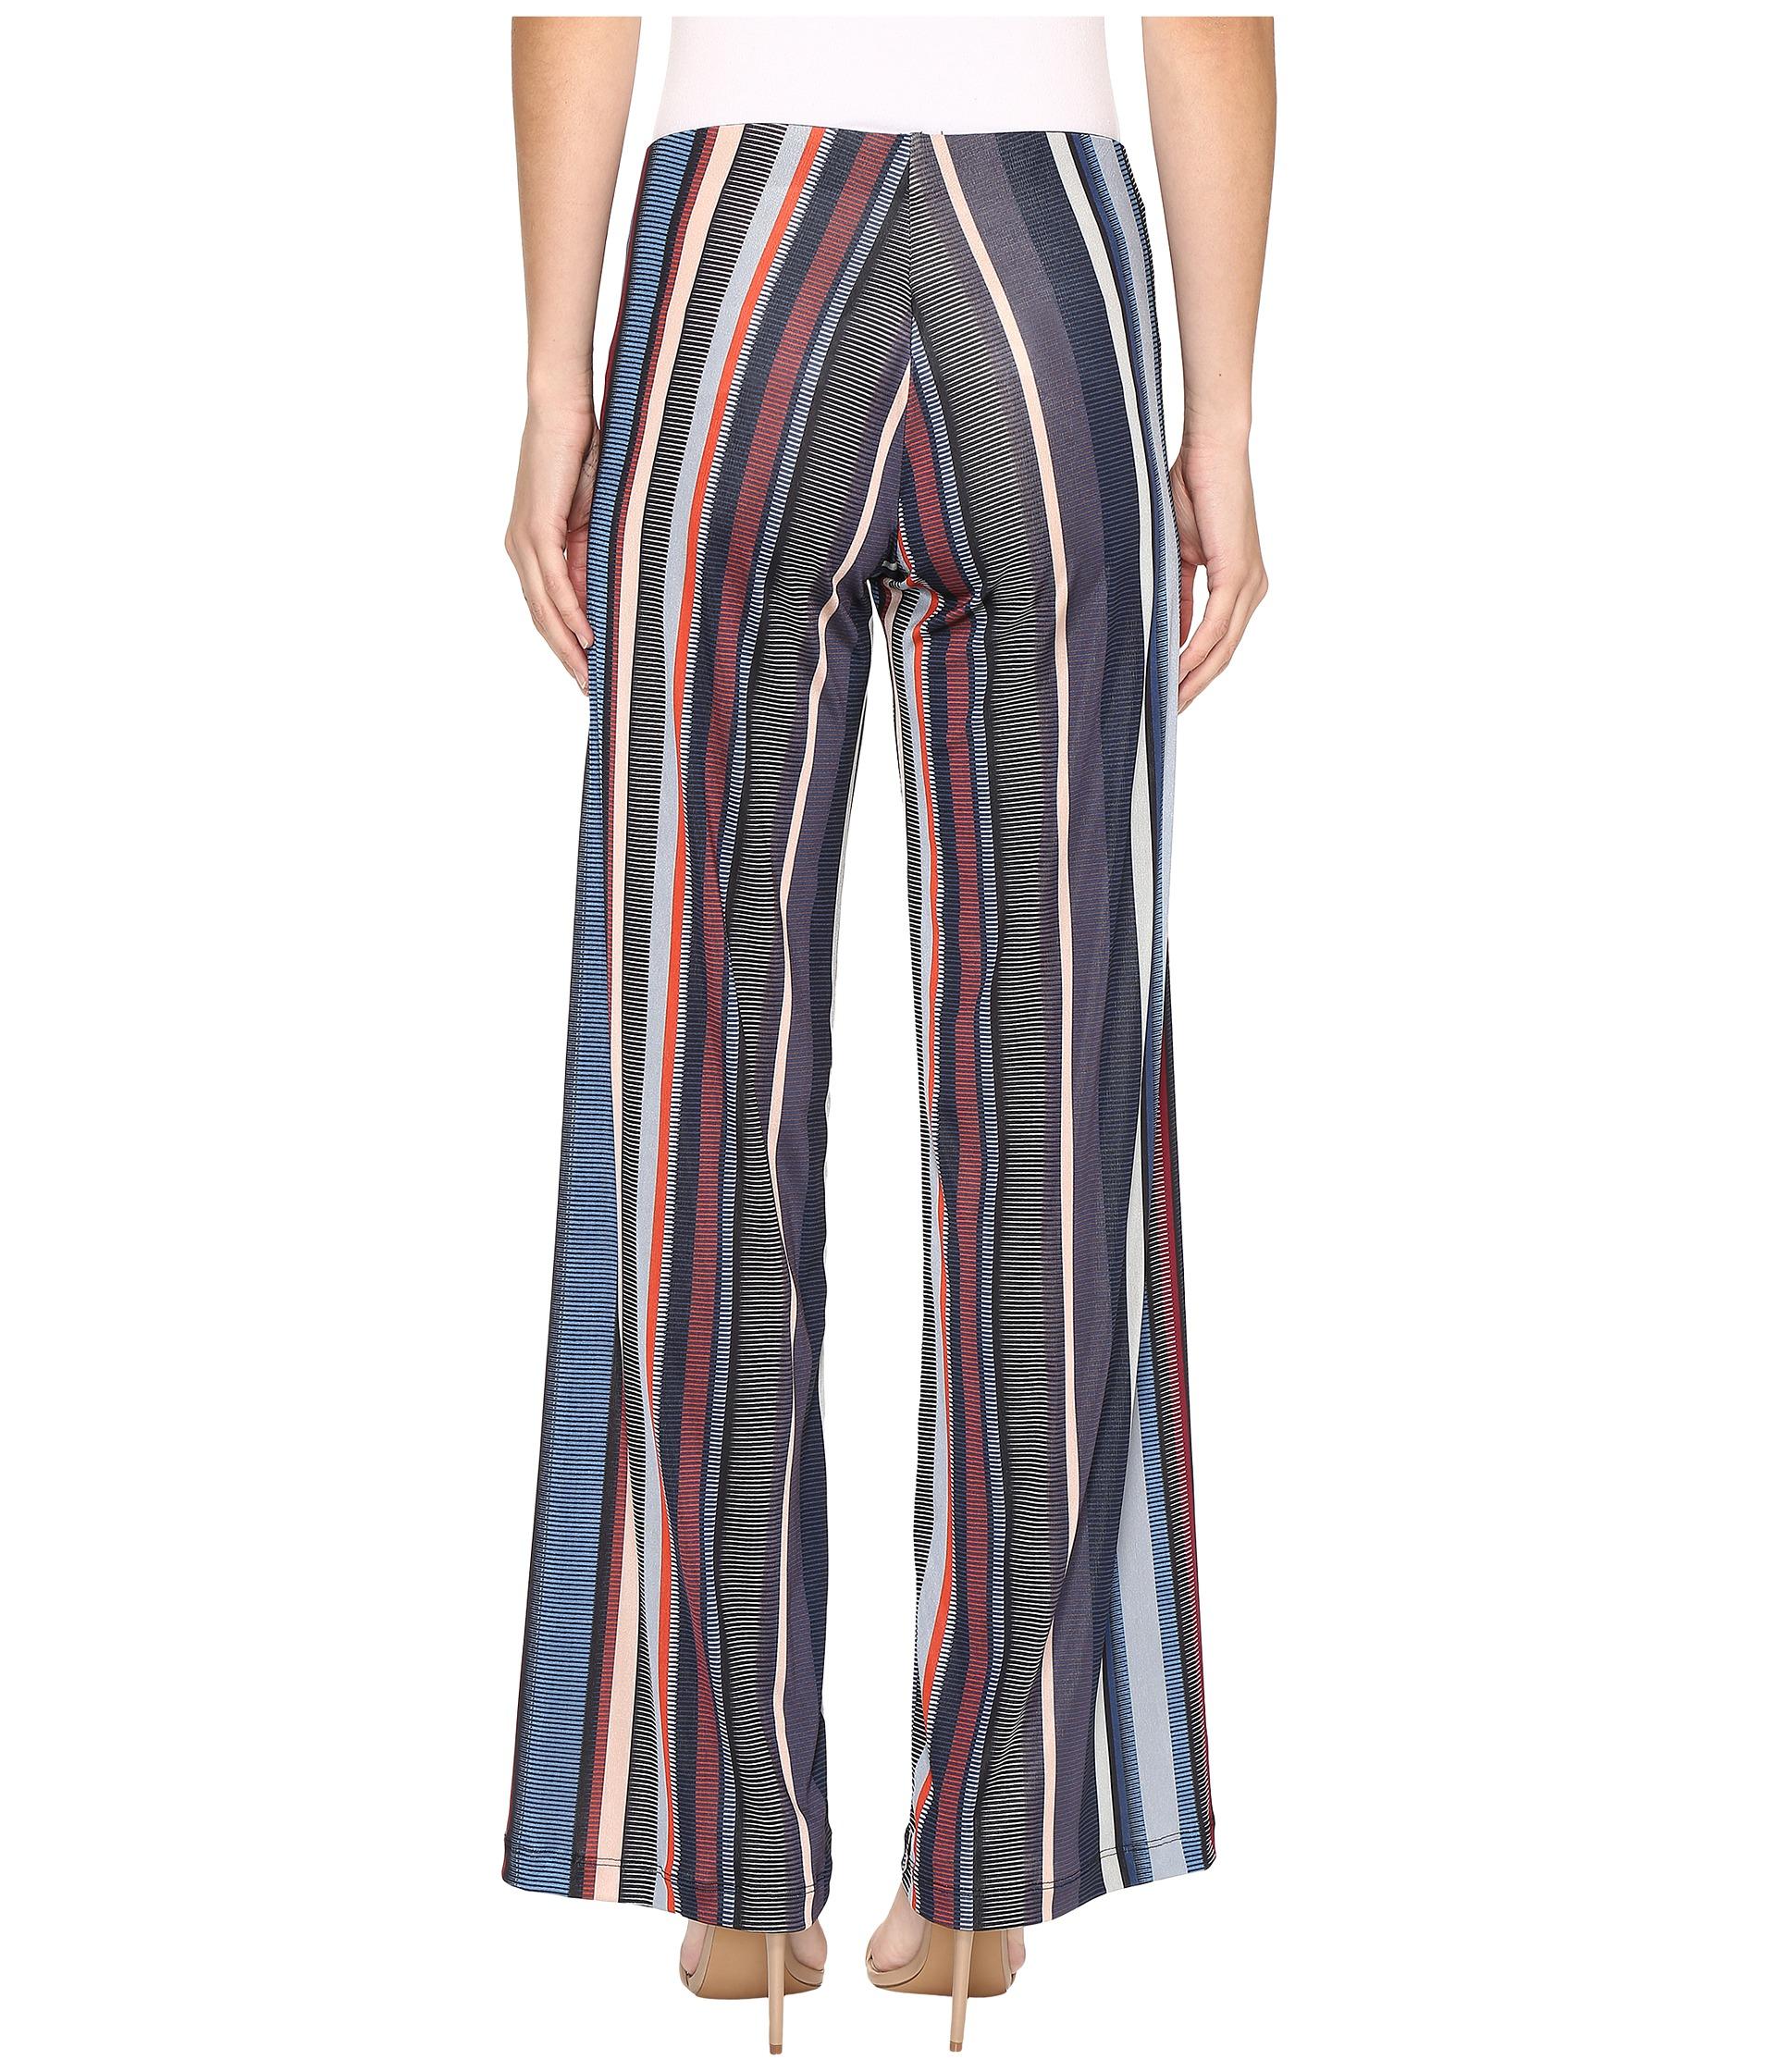 Multi Stripe Mens Pants: Dress Pants, Chinos, Khakis